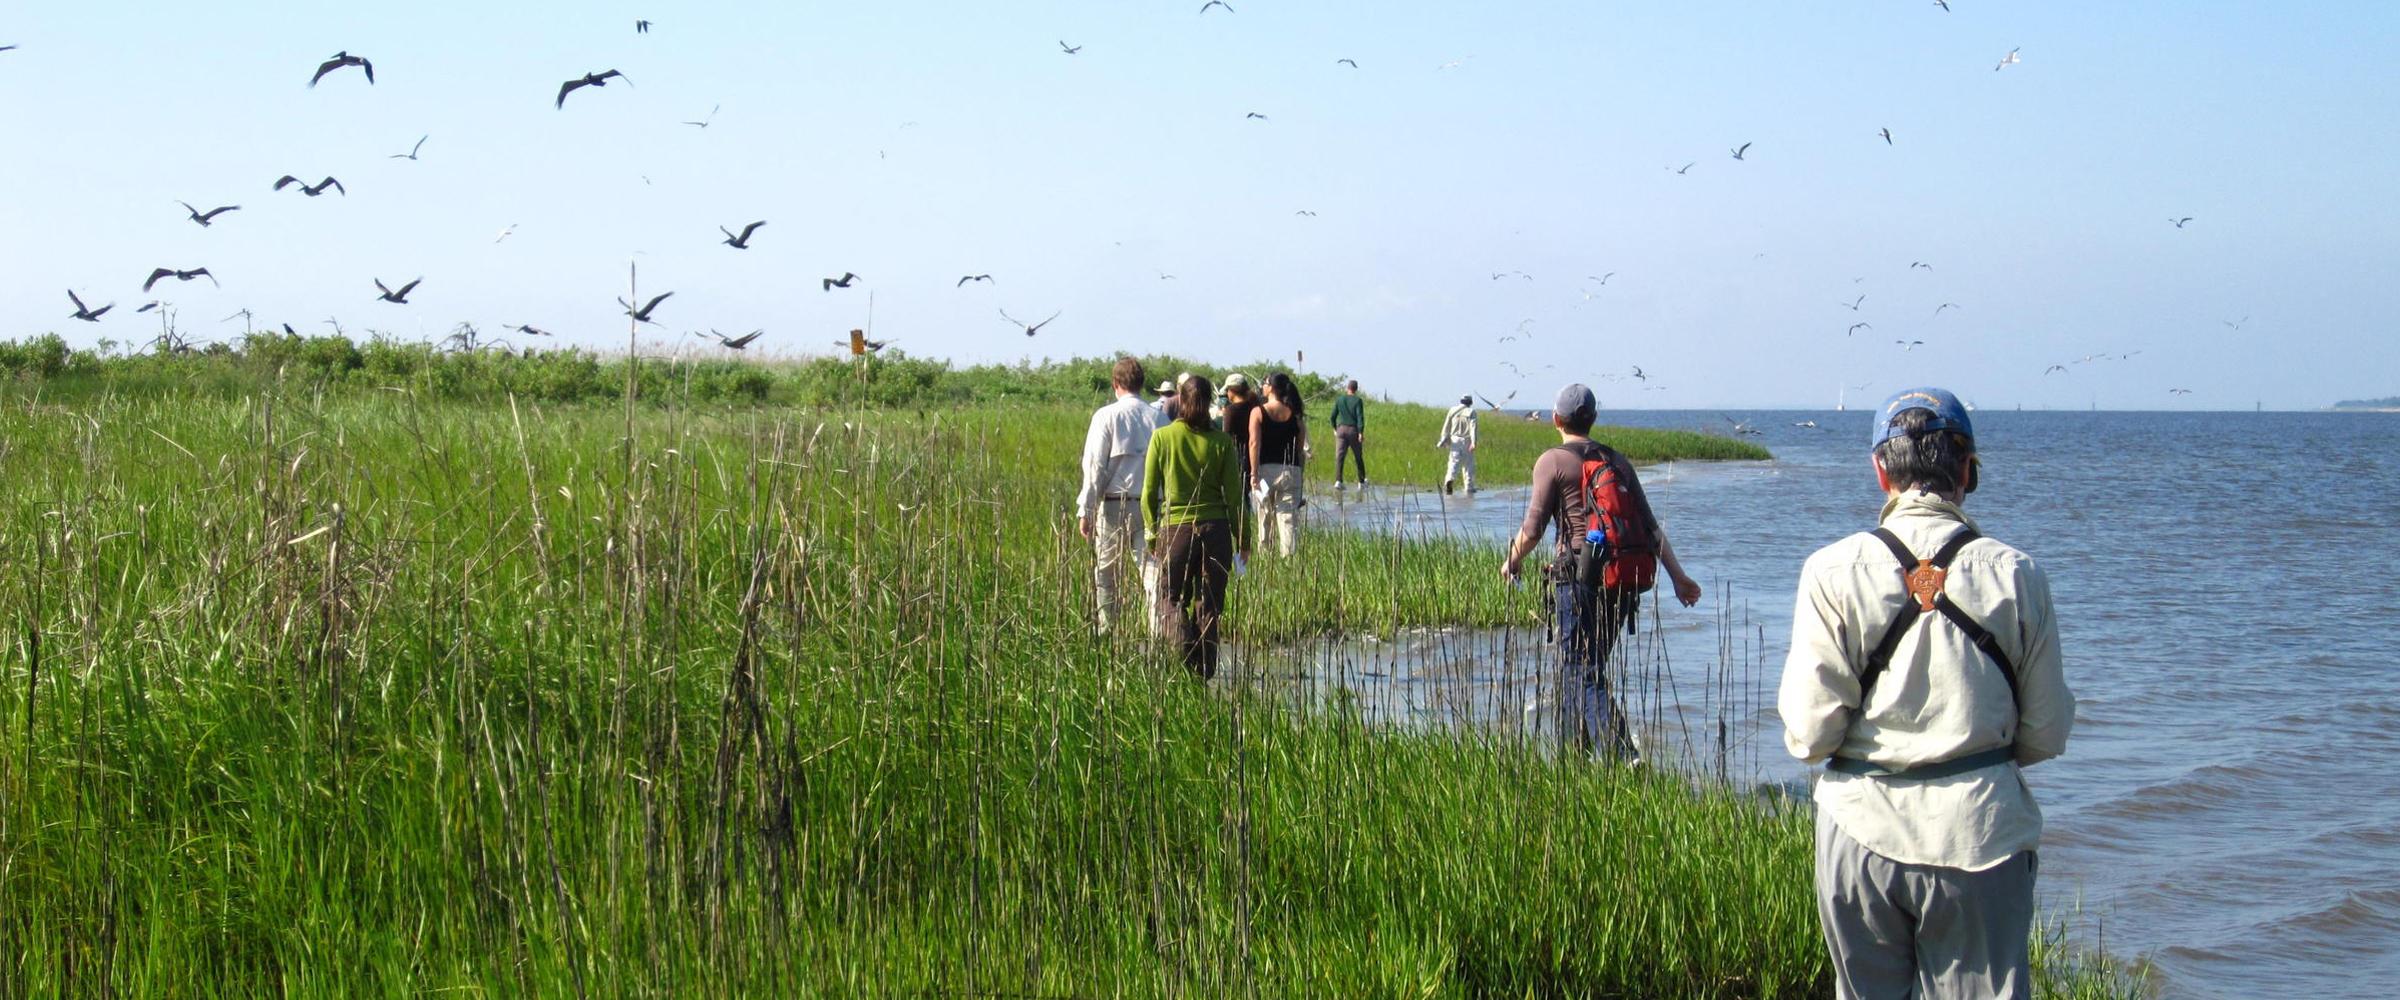 2011 Waterbird Census on North Pelican Island -